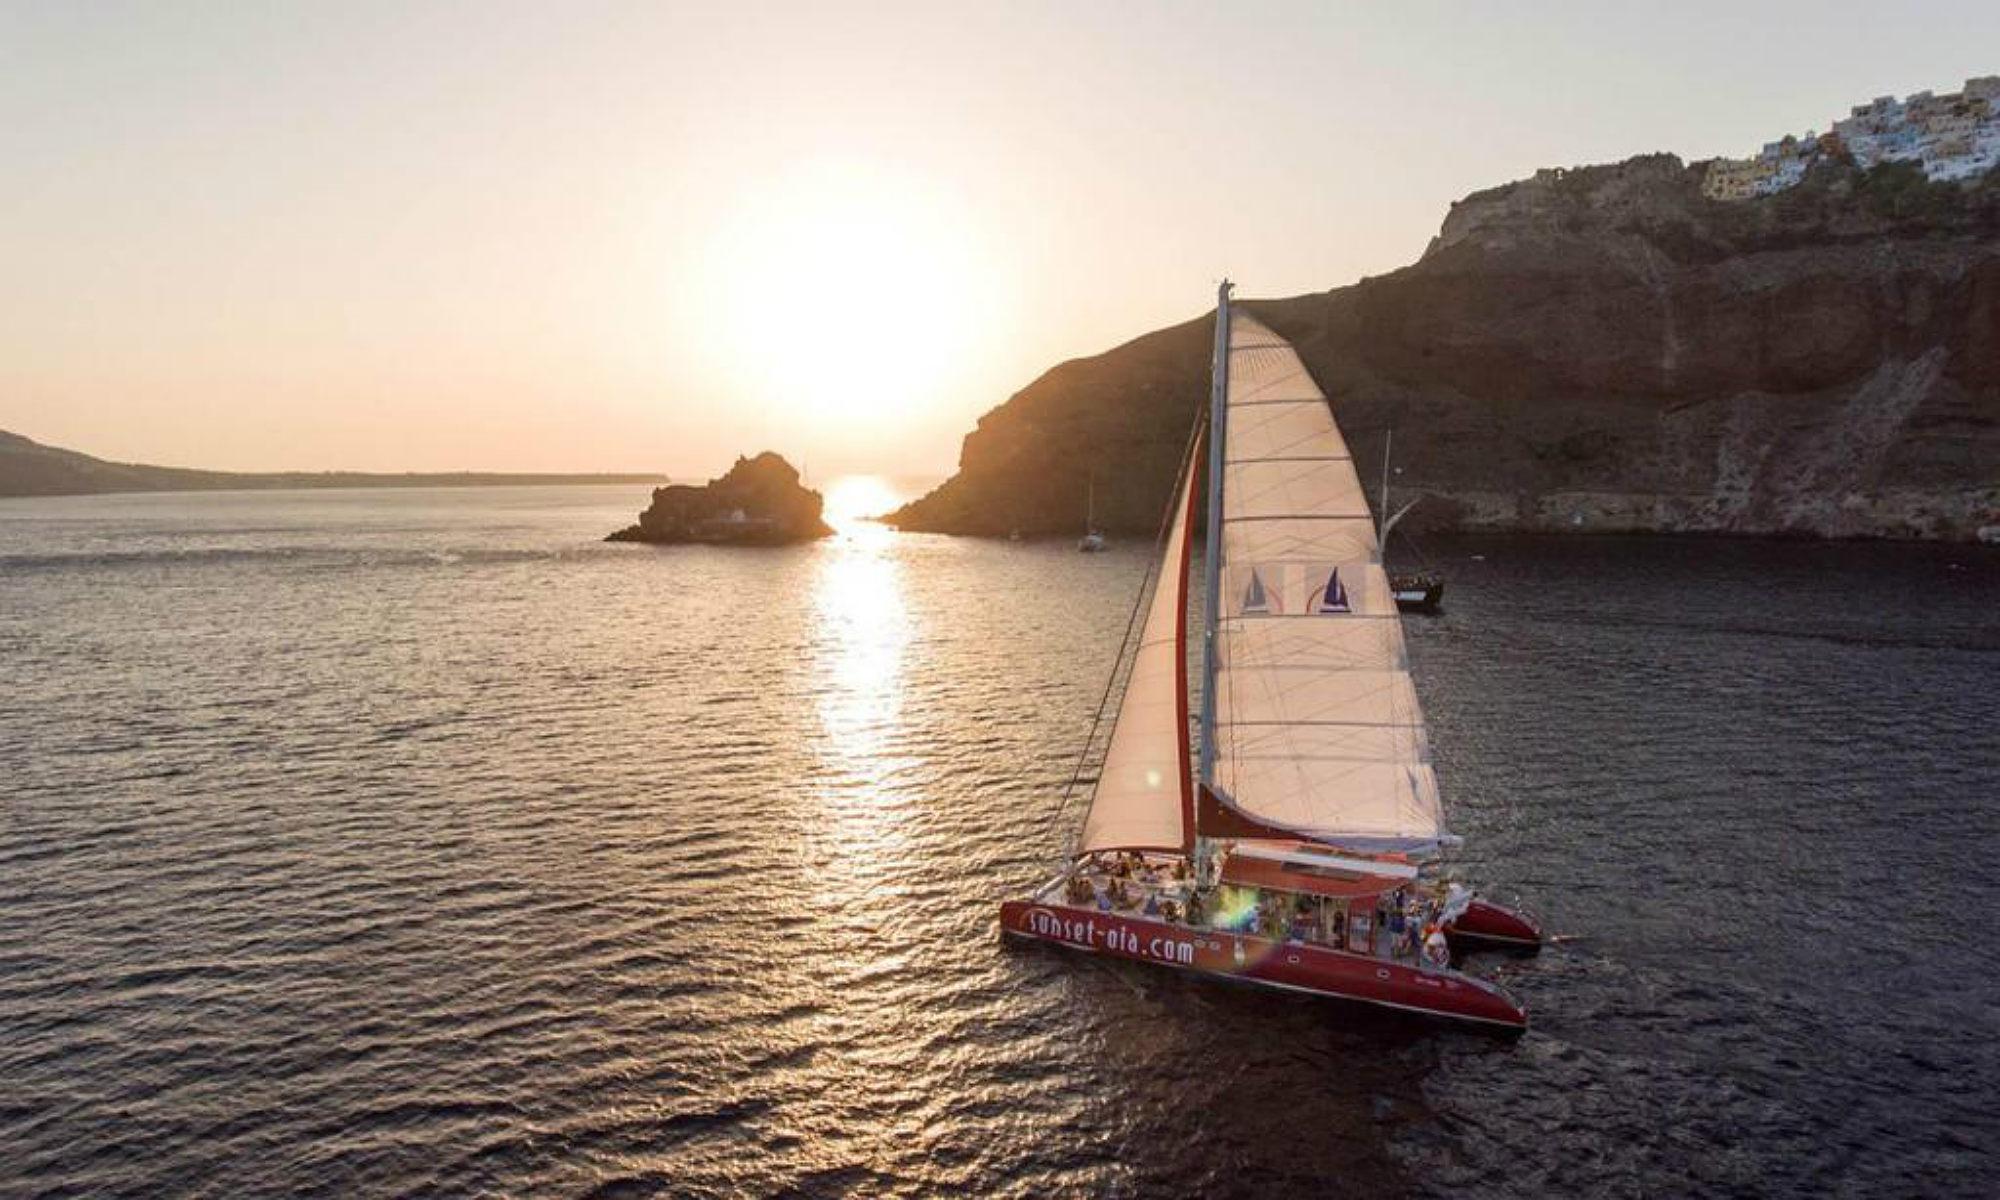 A catamaran sails around the island of Santorini at sunset.